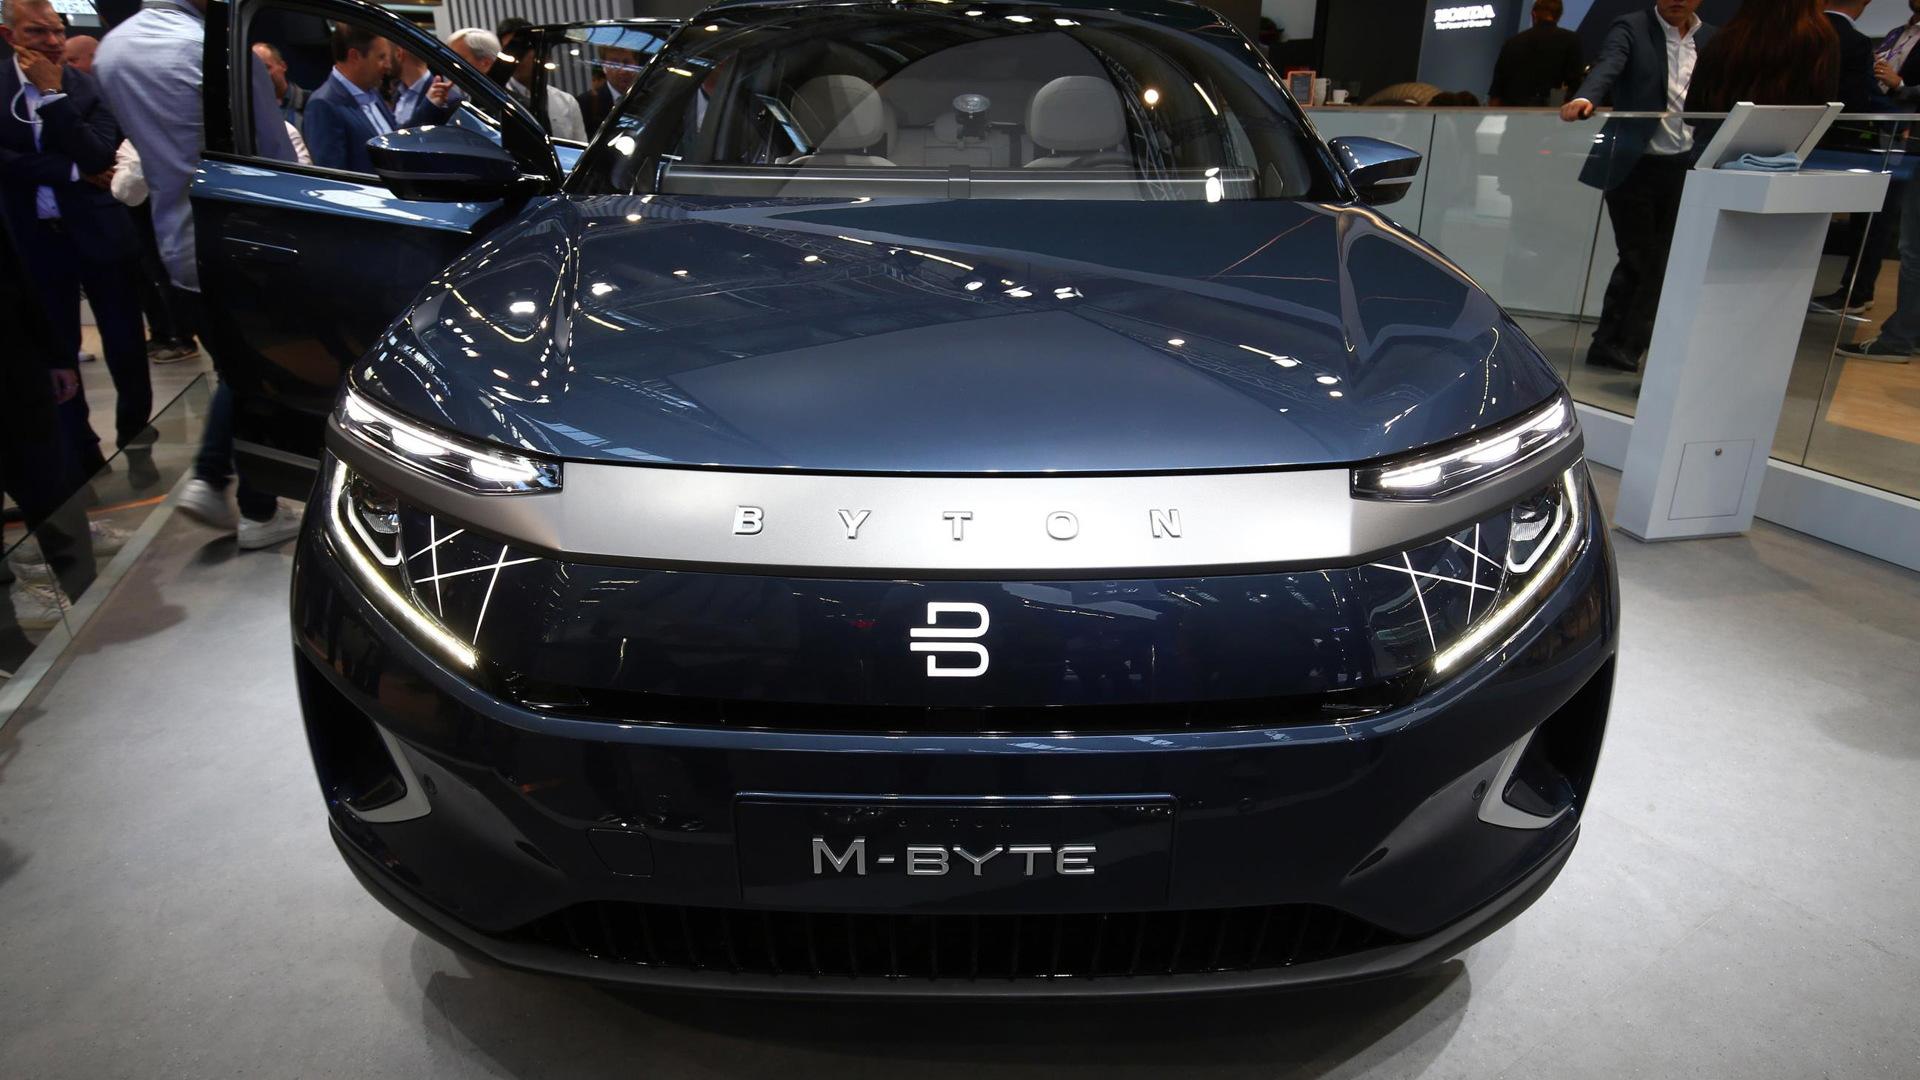 2020 Byton M-Byte